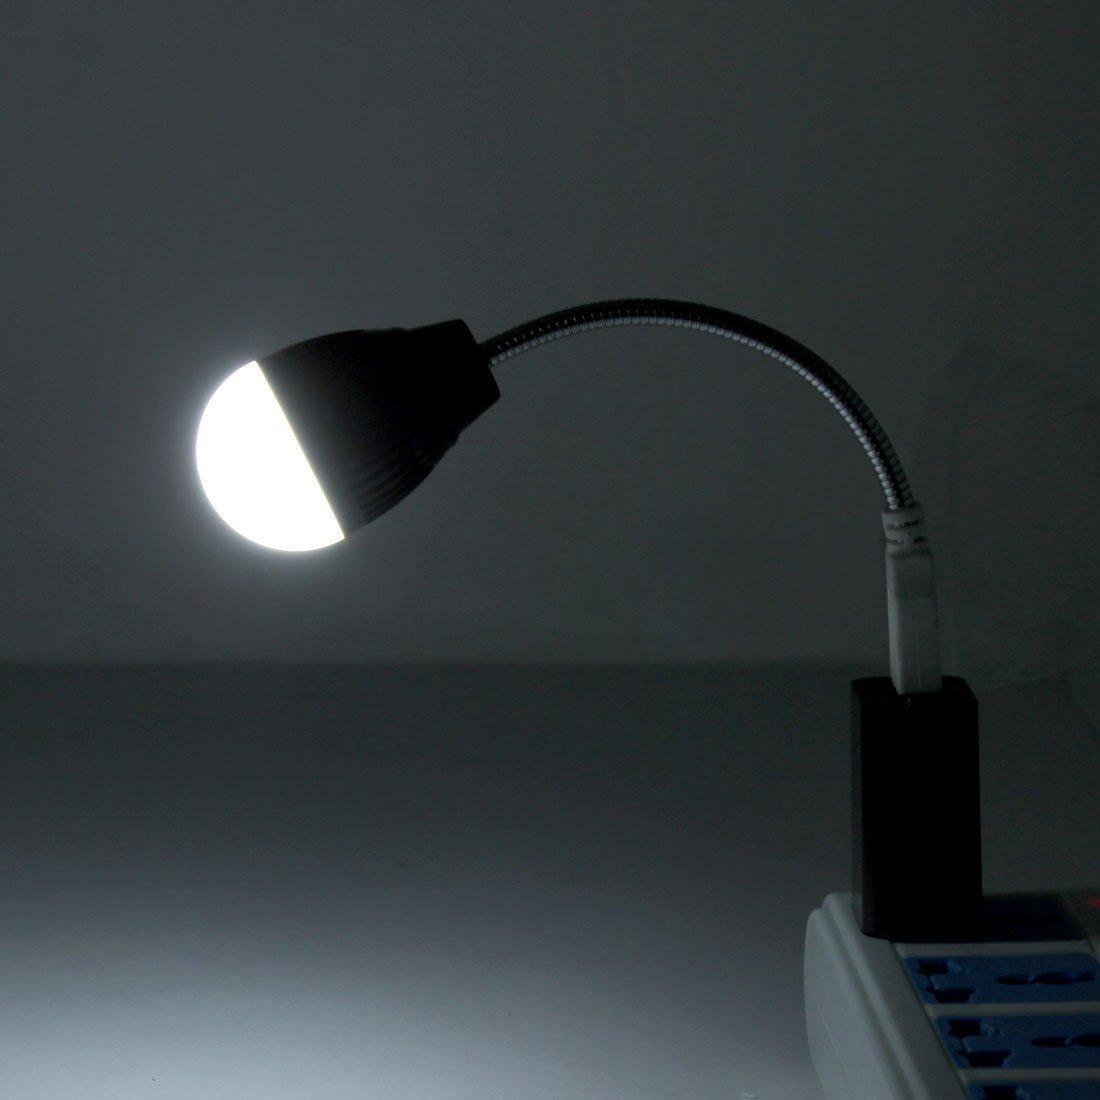 Amazon.com: eDealMax DC 5V 1W Mini USB Portable Flexible de LED de luz de la lámpara Negro Para PC de escritorio del ordenador: Electronics